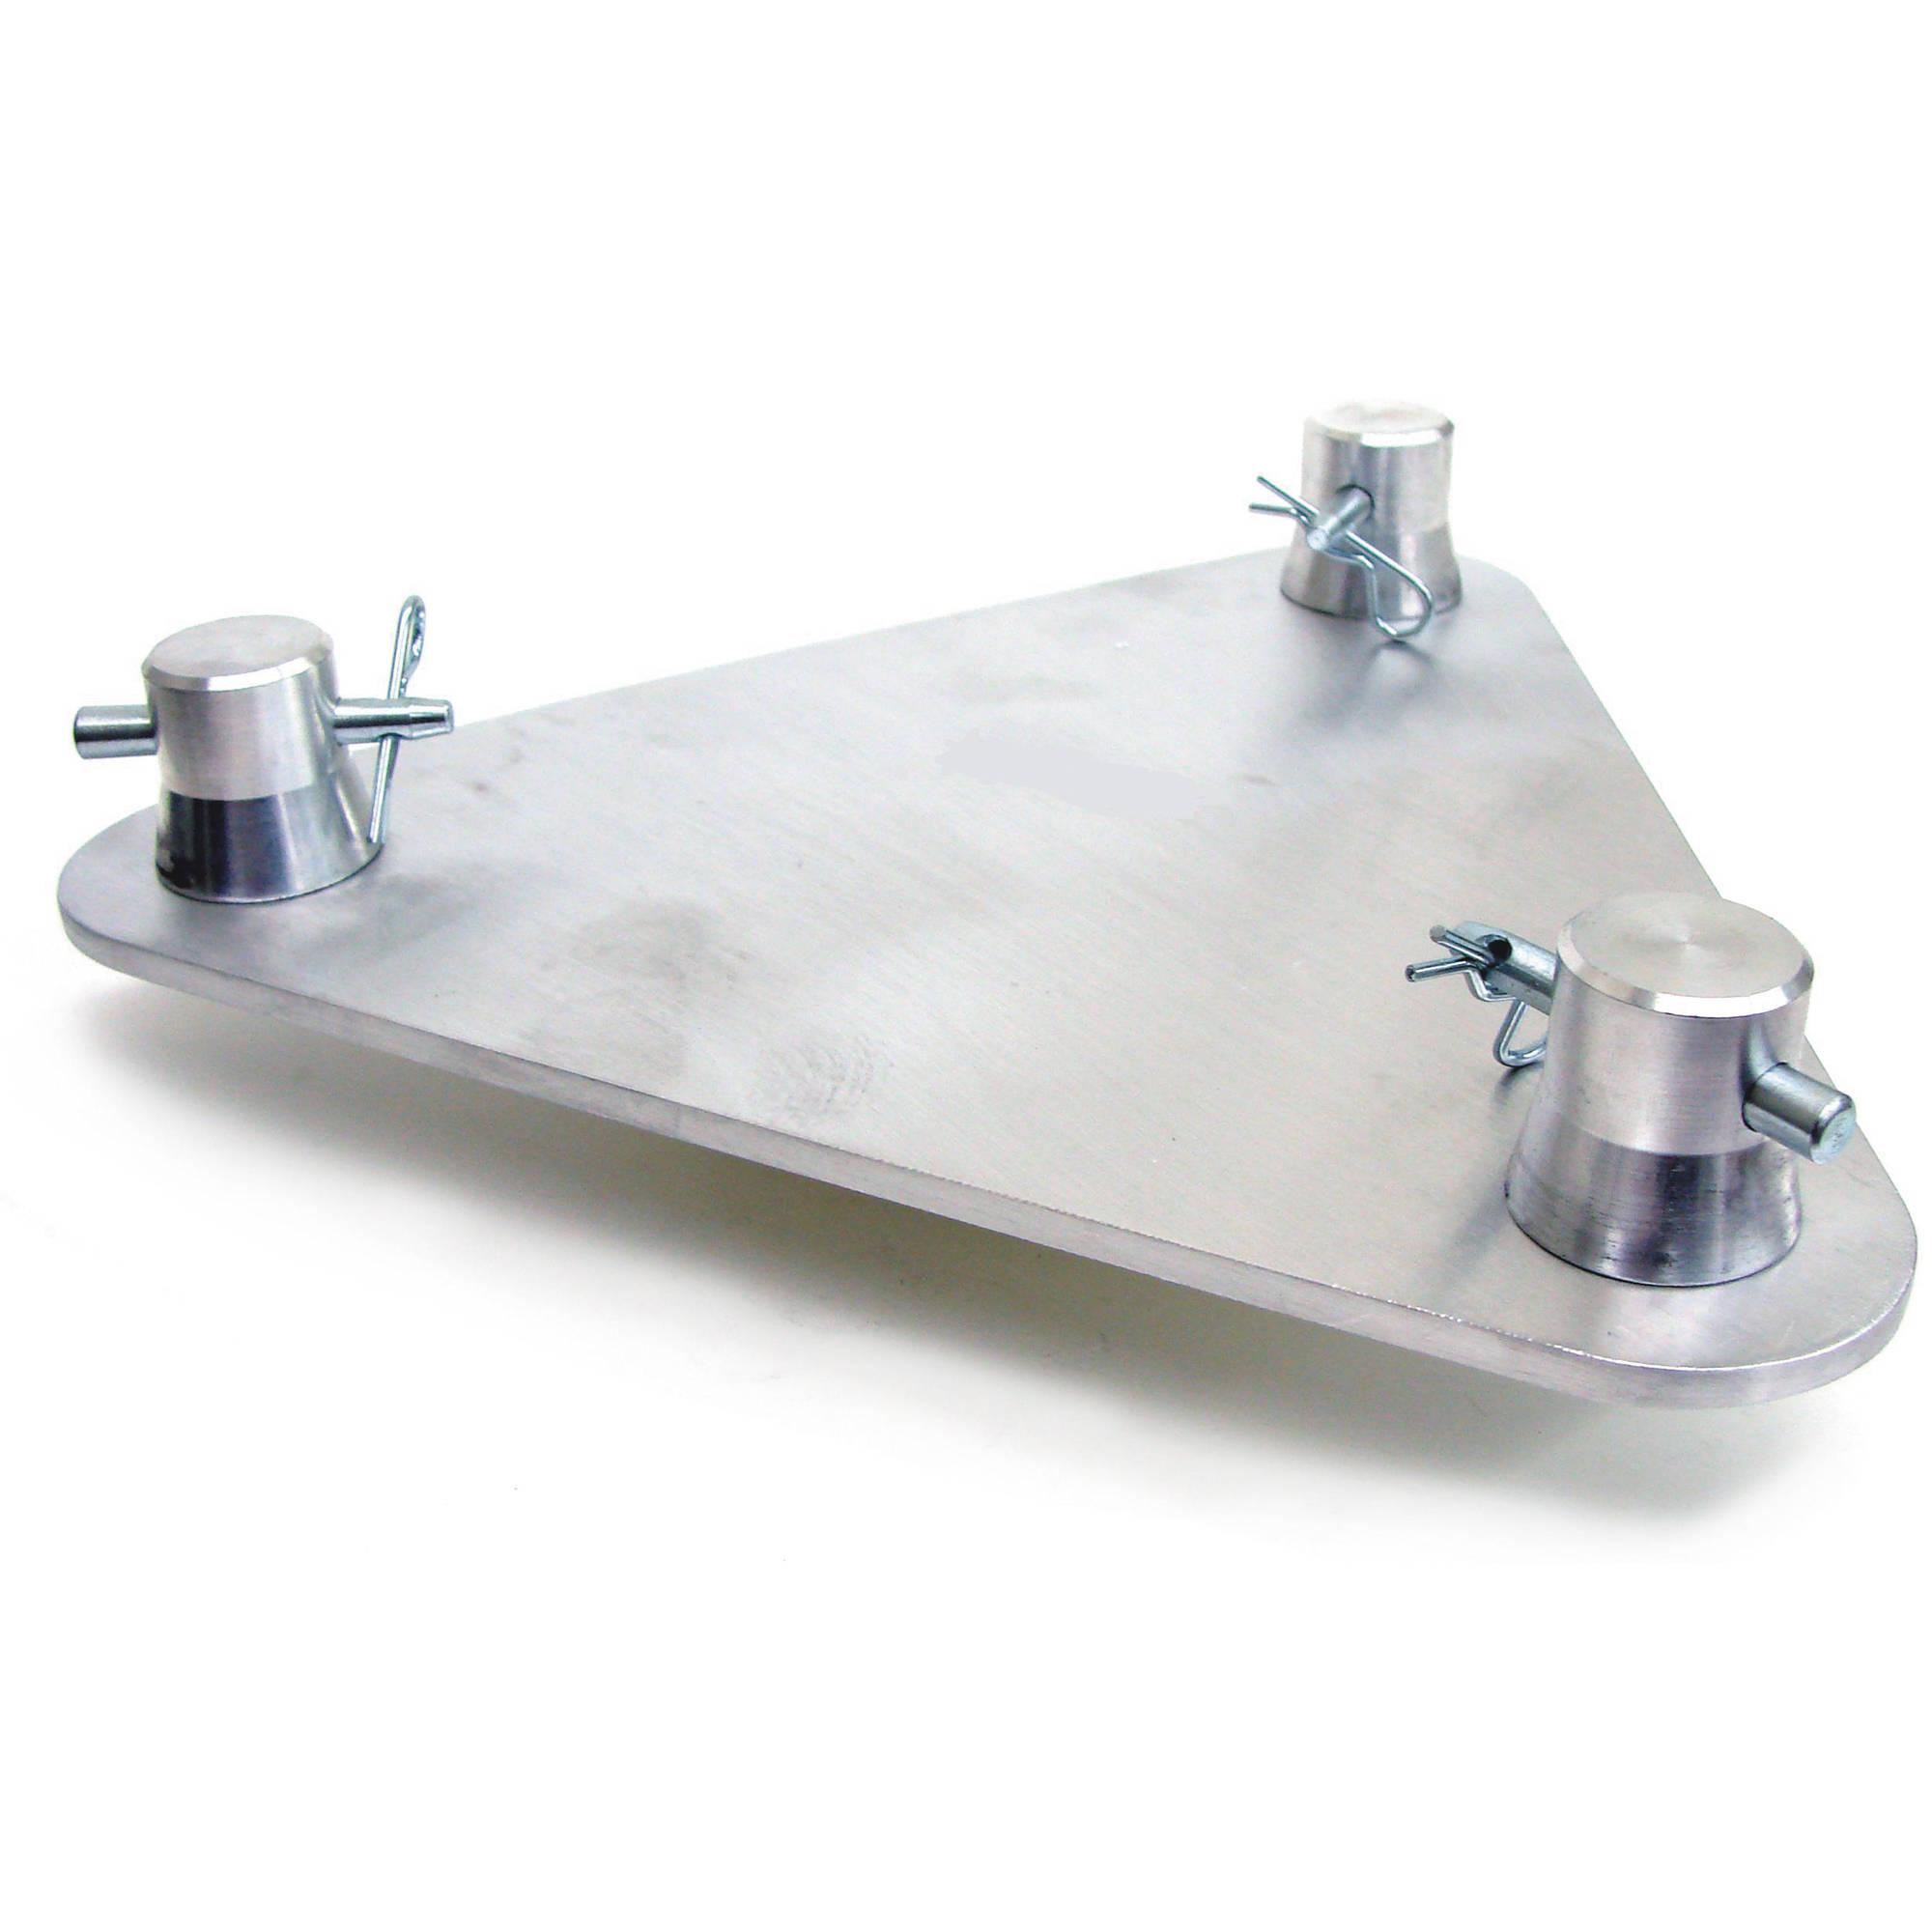 global-truss-tr-96129-base-plate.jpeg